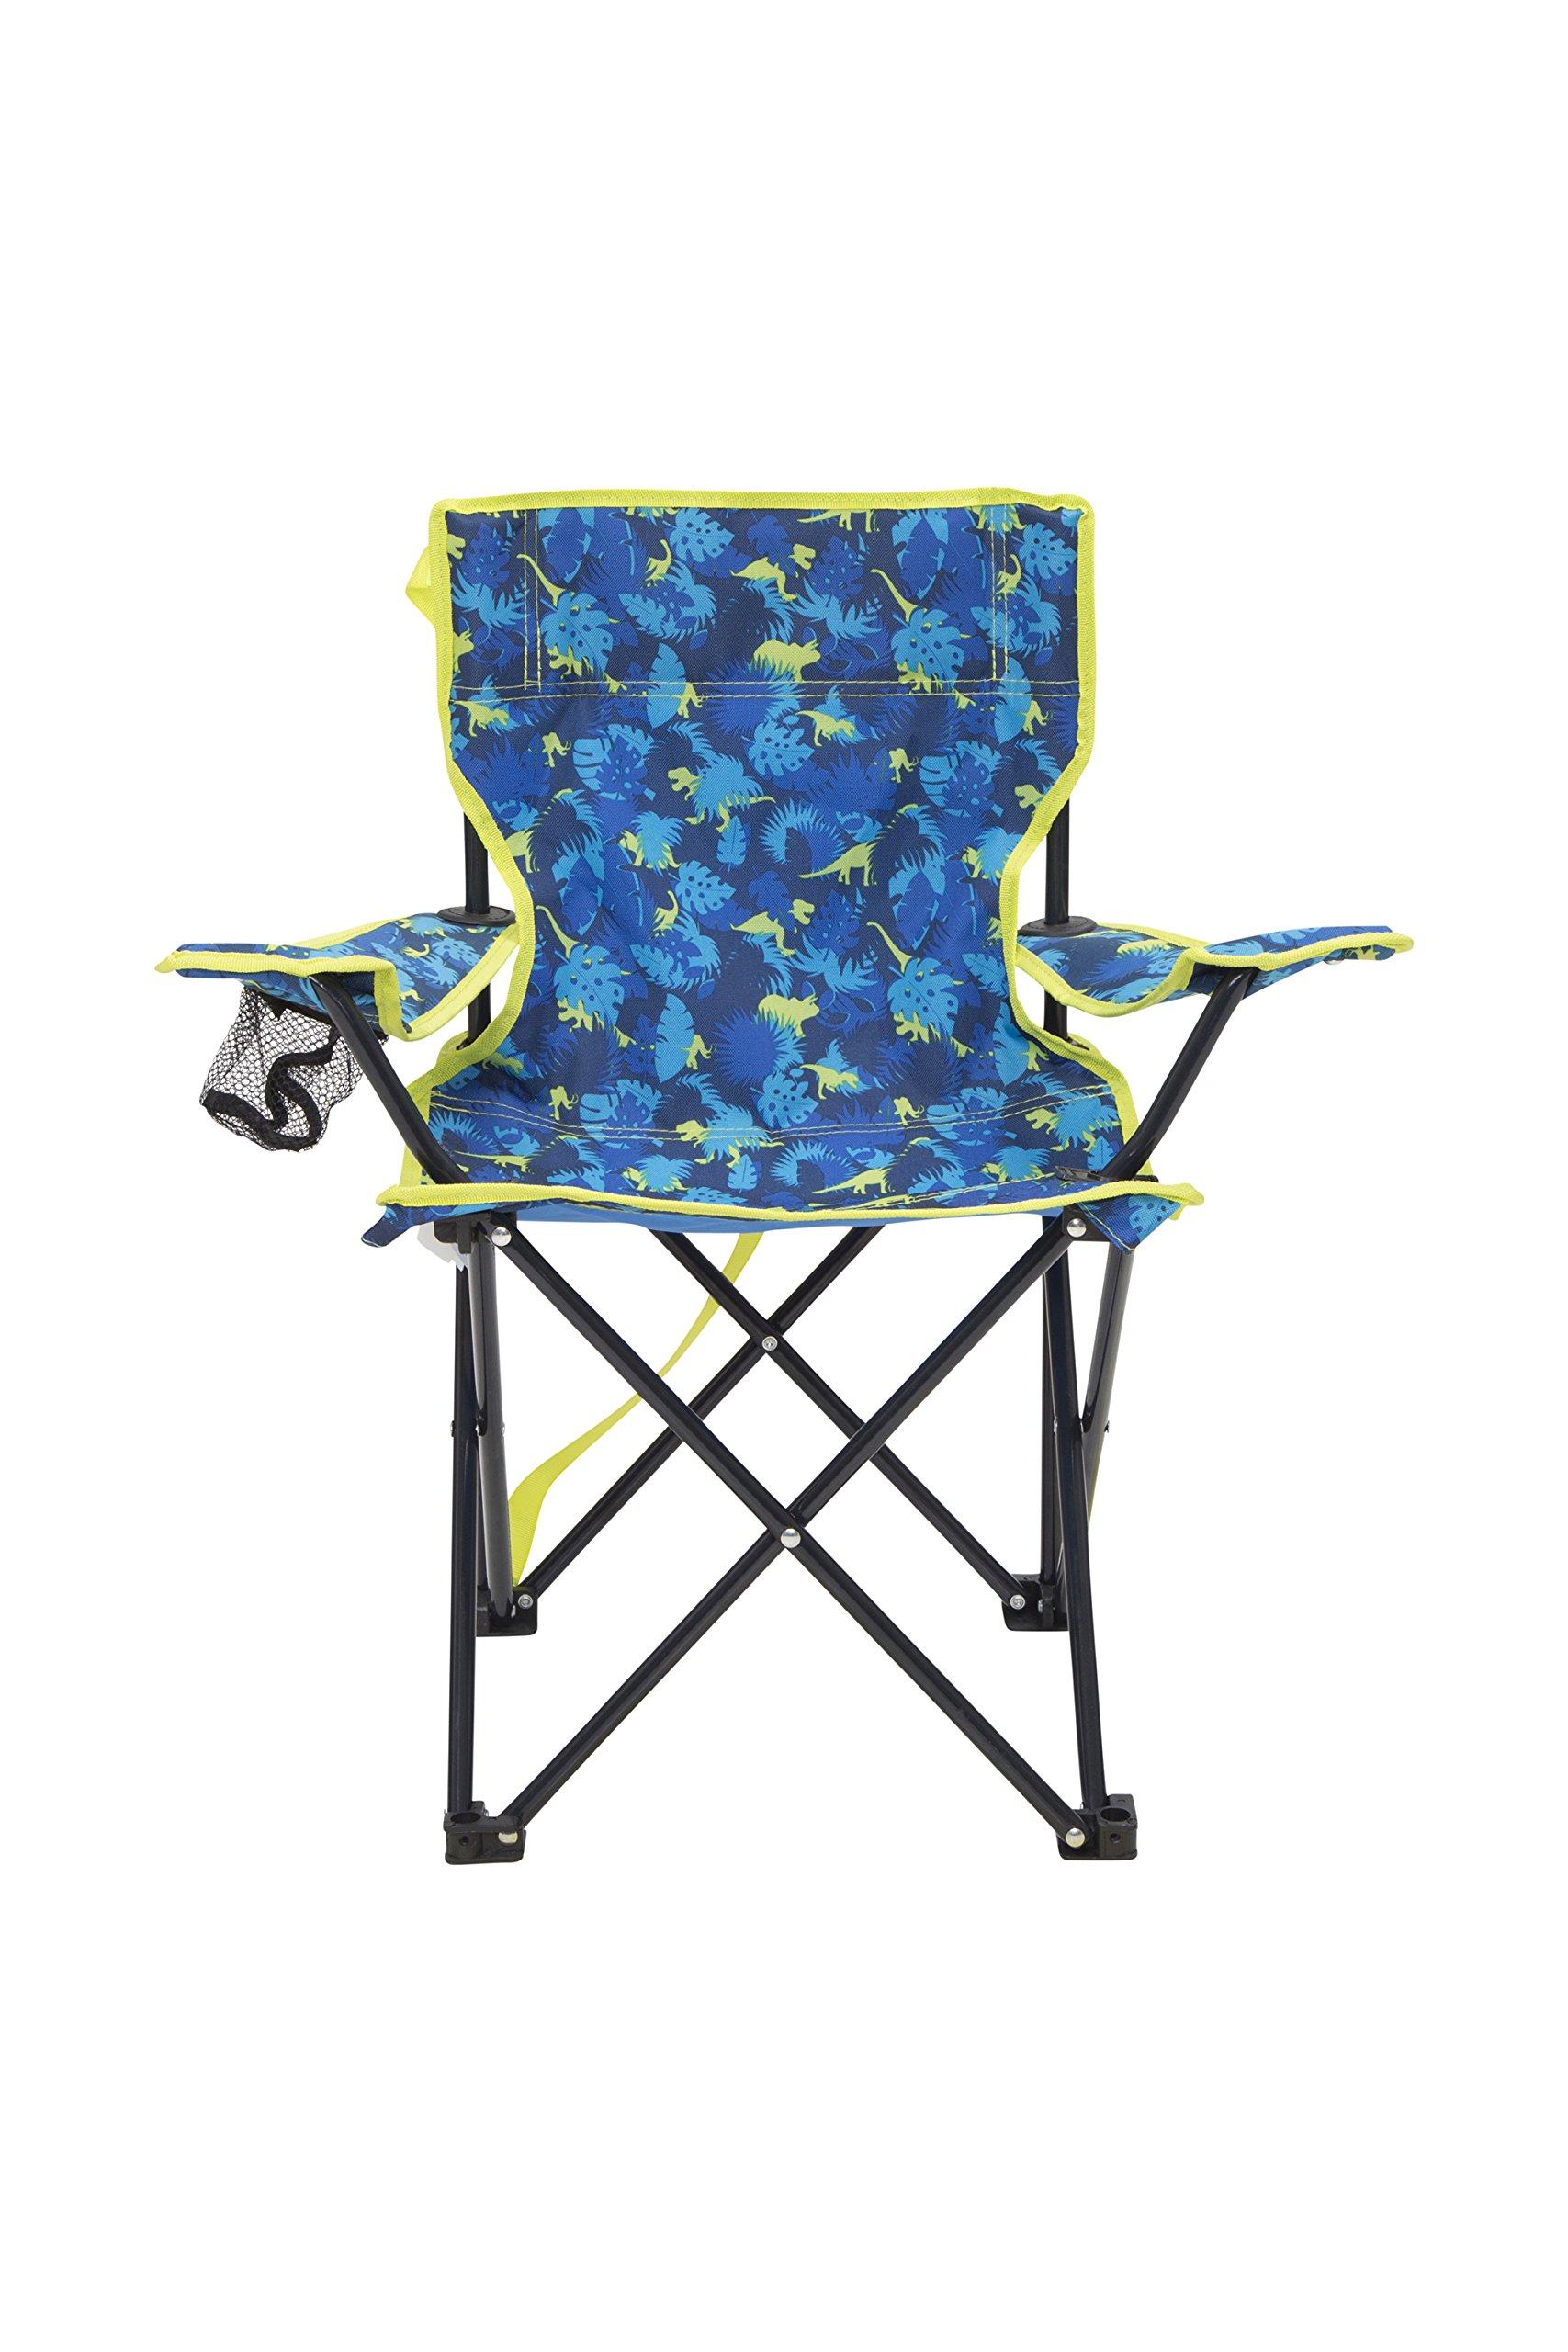 Disney 55171 Star Wars Kids Camping Chair